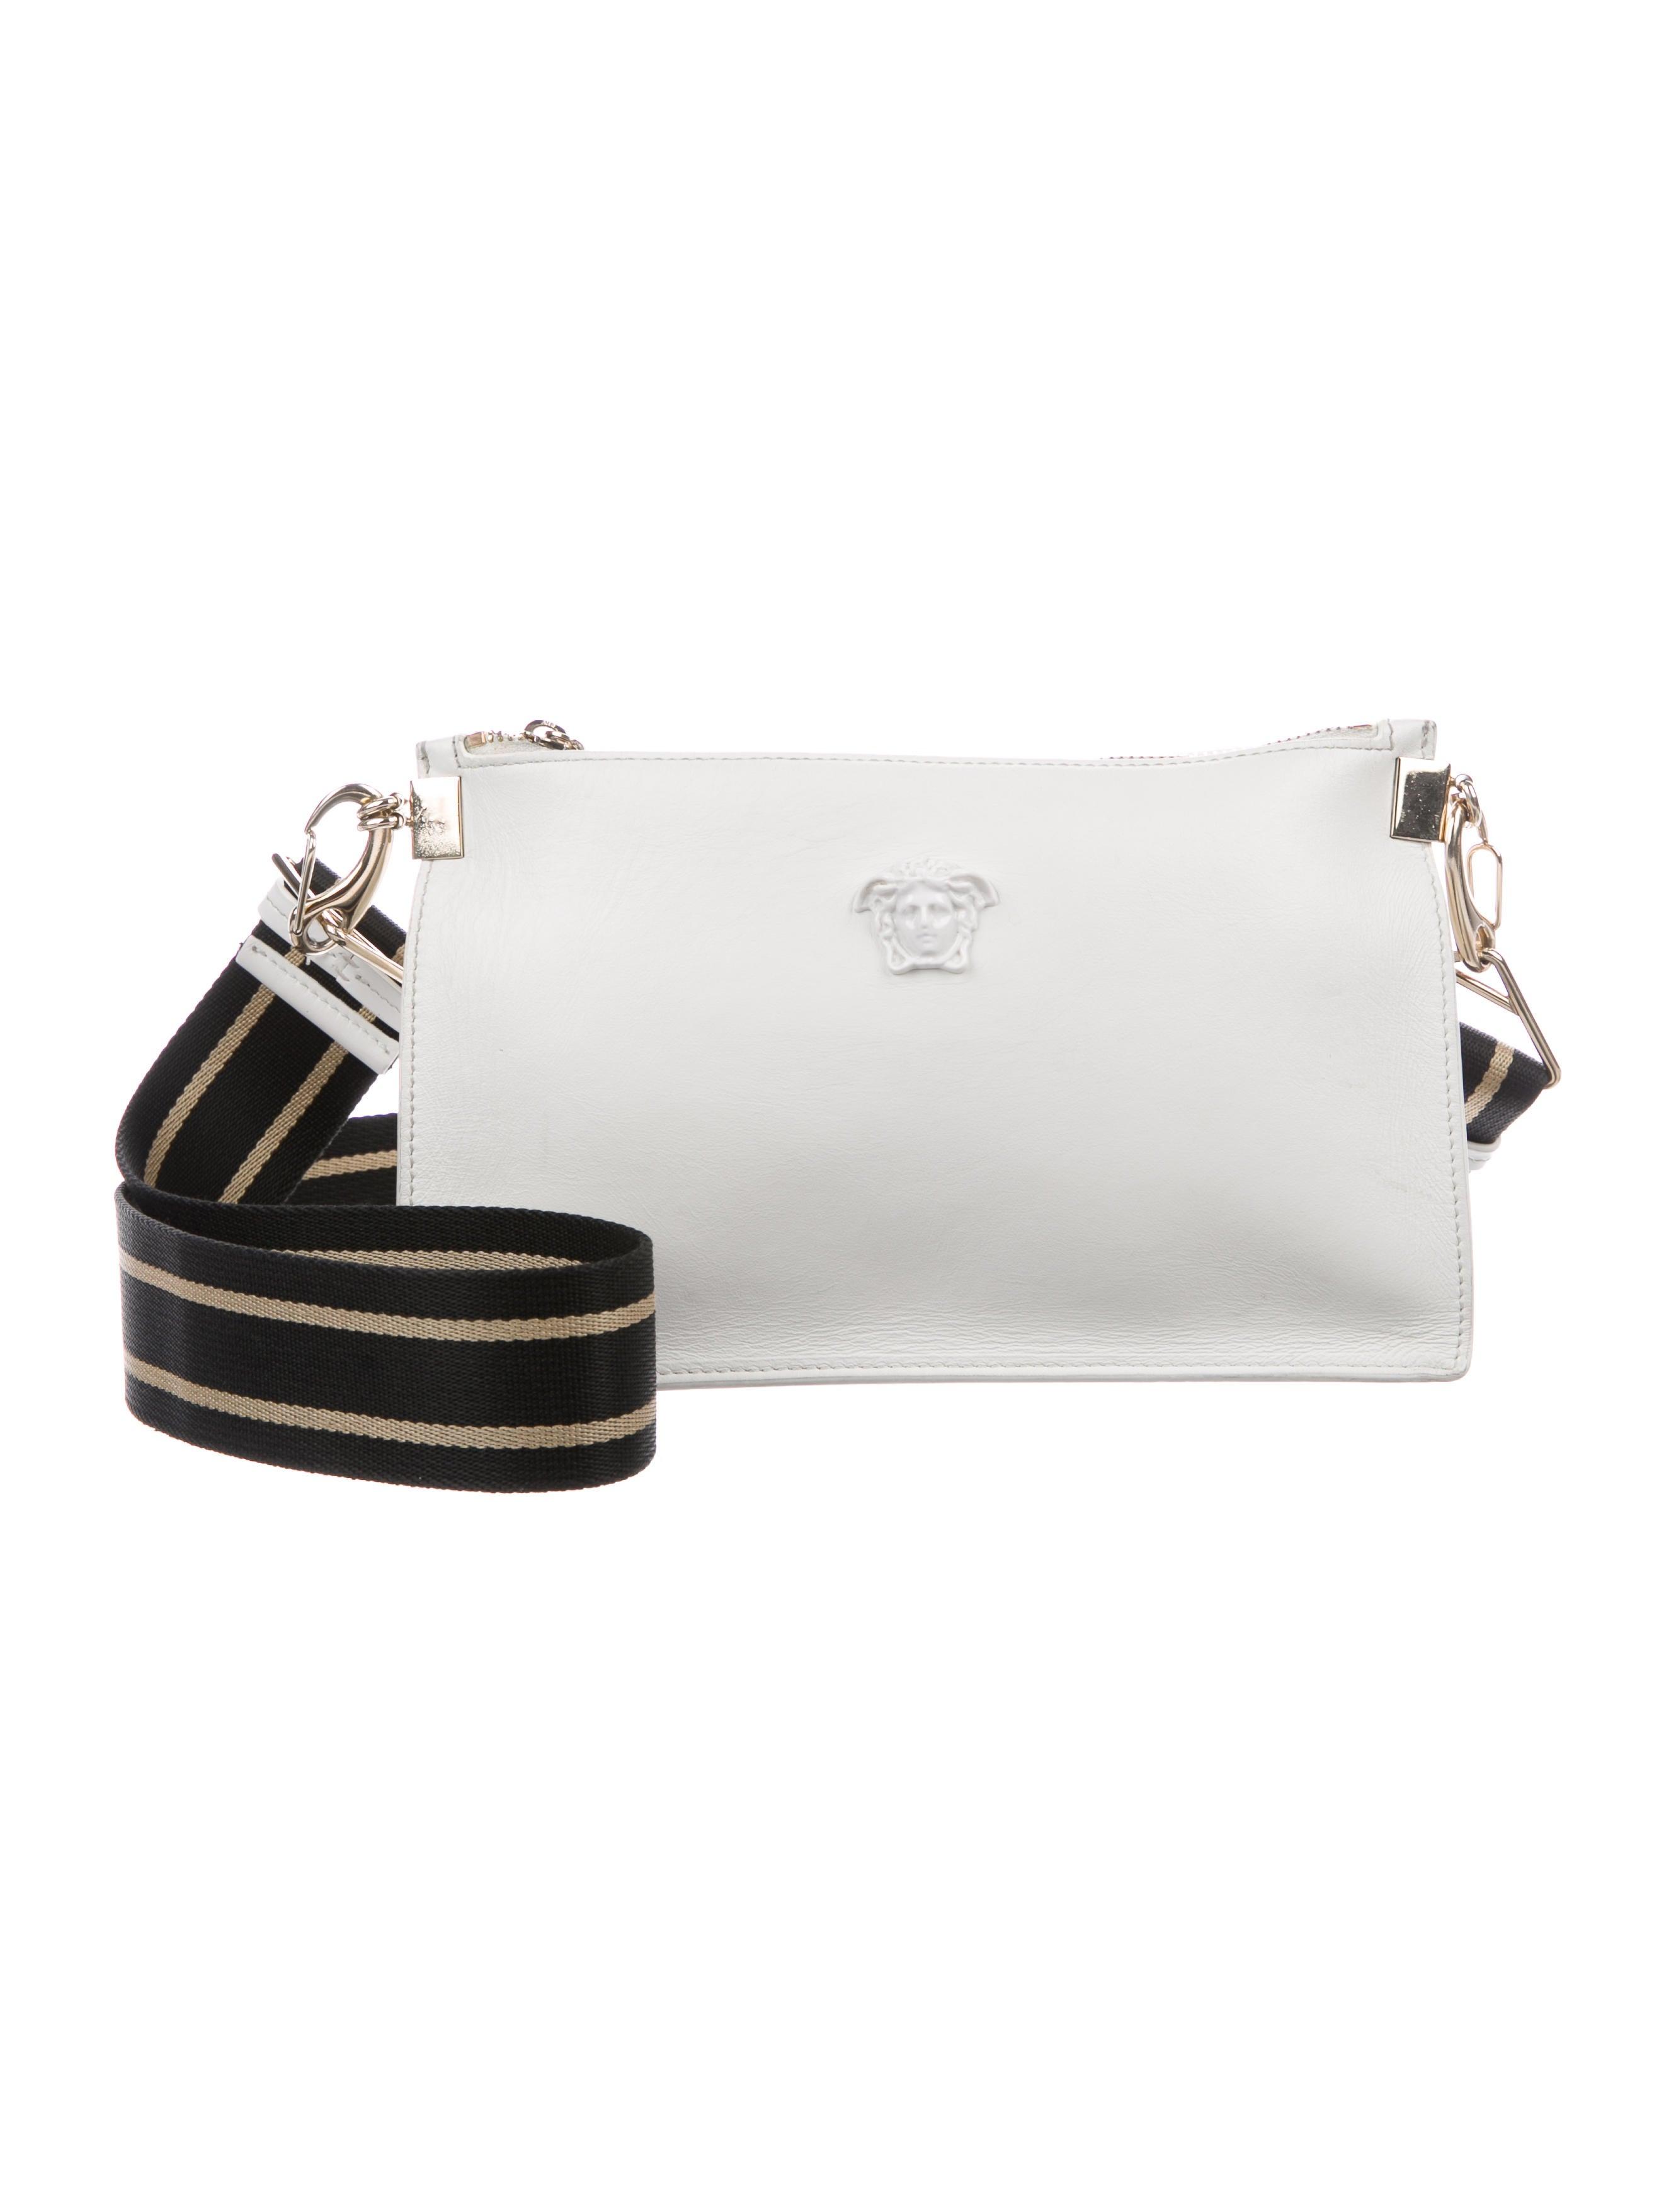 74cf53cebc Versace 2018 Medusa Palazzo Crossbody Bag - Handbags - VES37381 ...